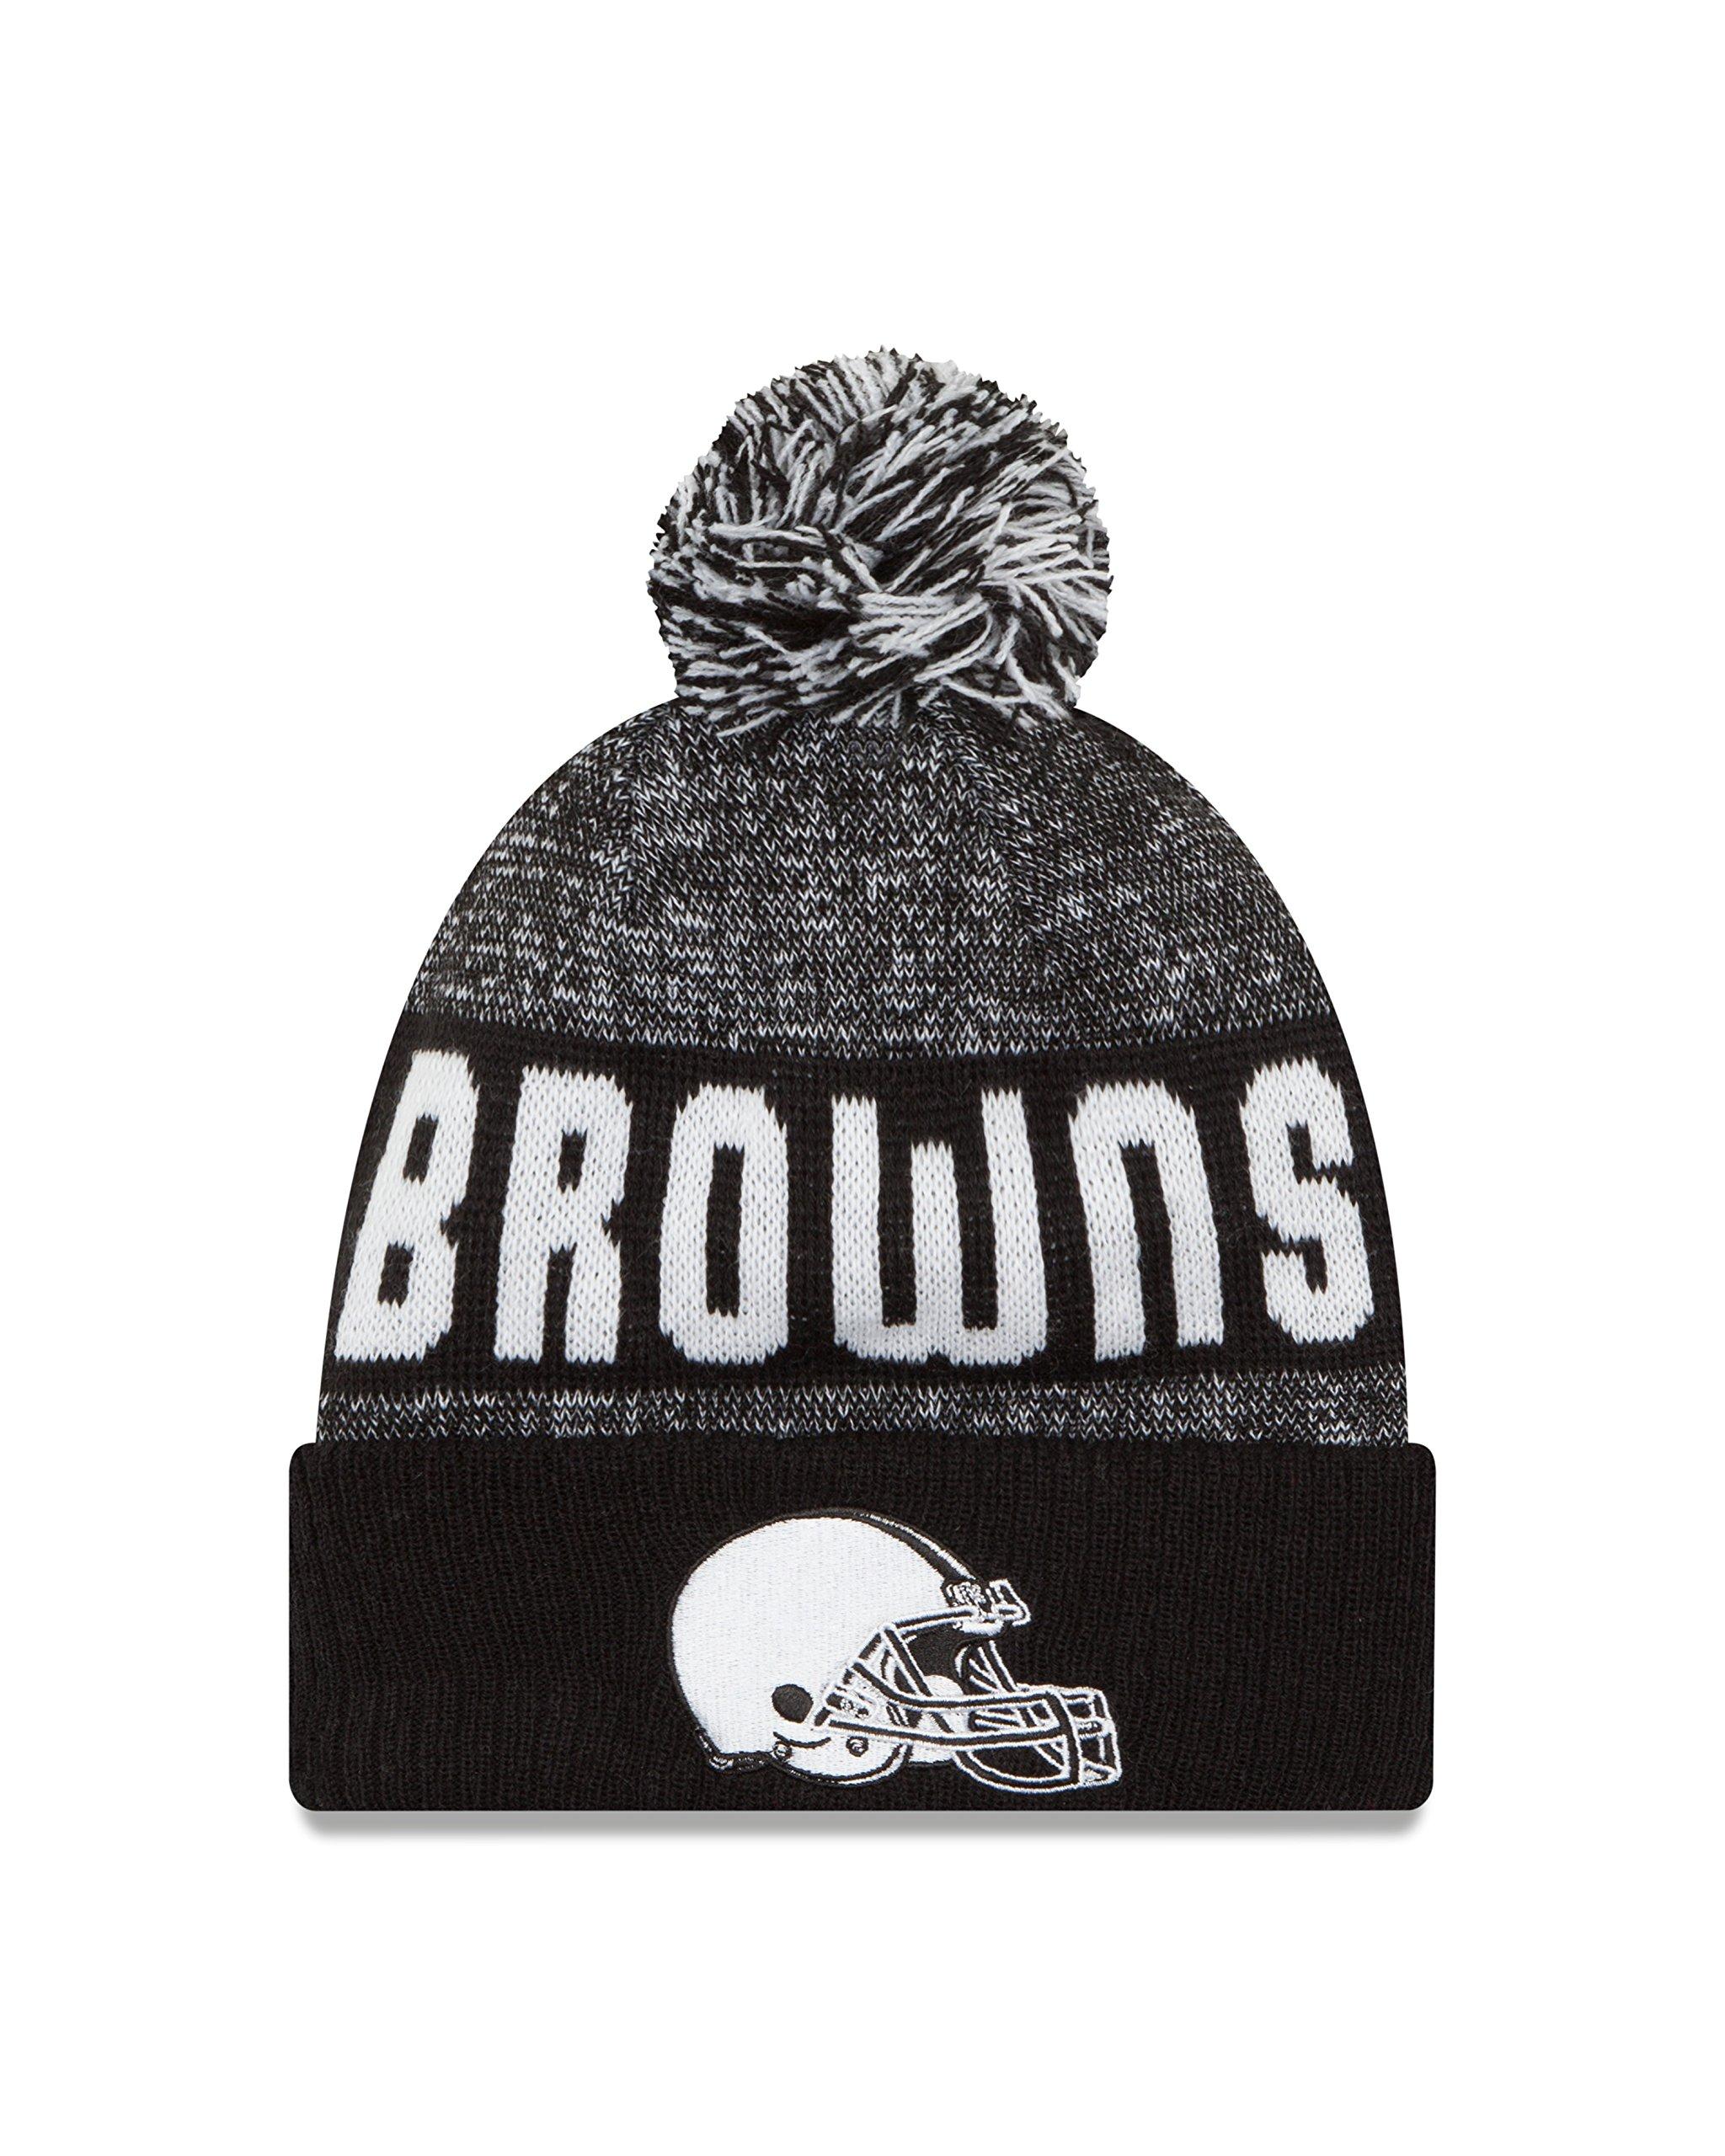 New Era NFL Cleveland Browns 2016 Sport Knit Beanie, One Size, Black/White